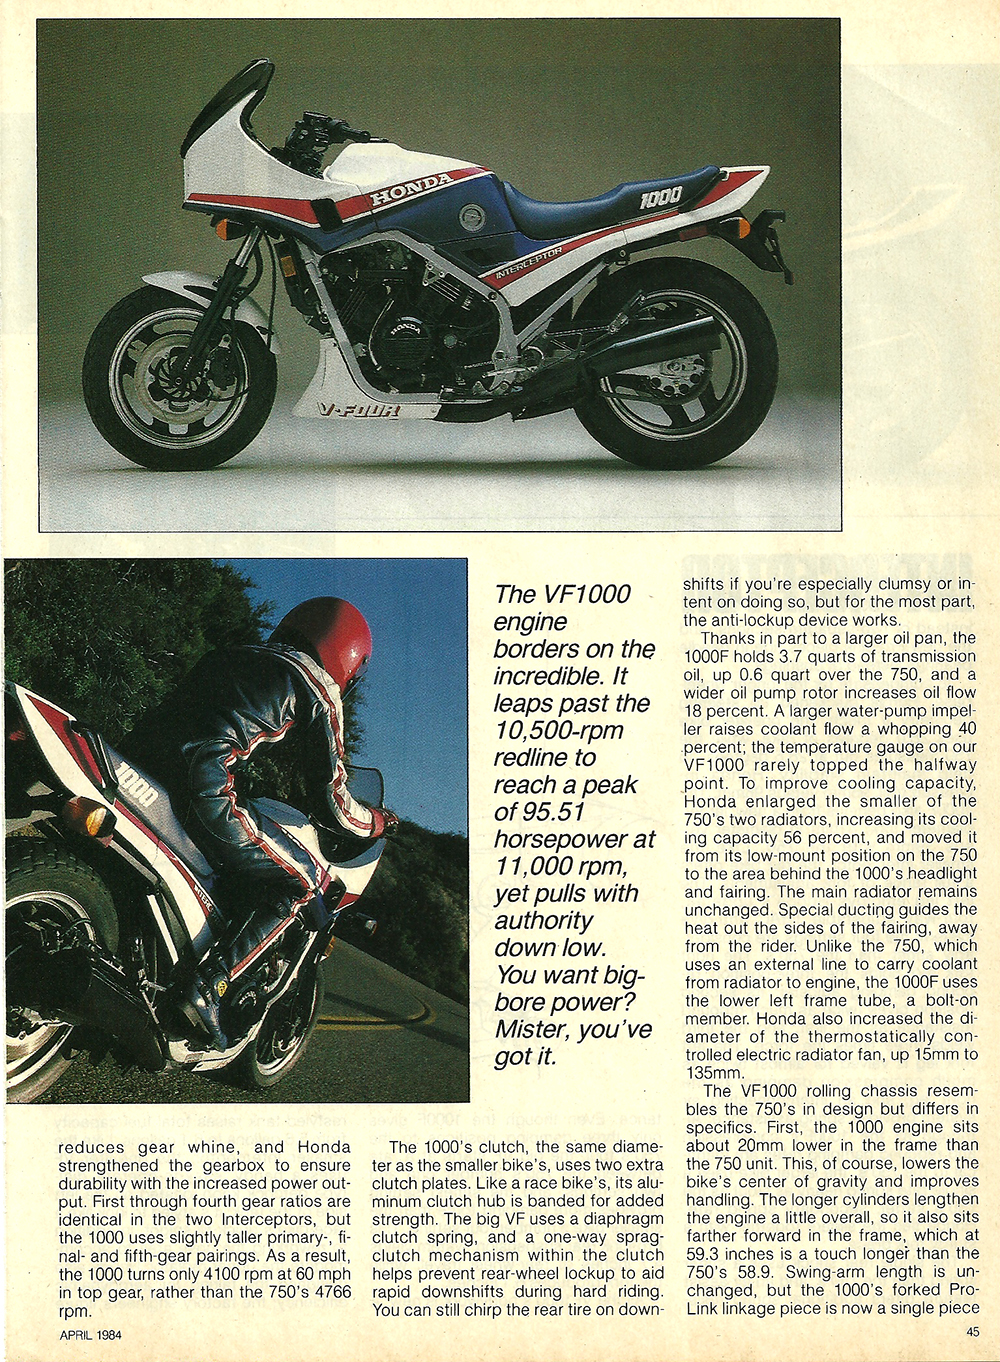 1984 Honda VF1000 Interceptor road test 4.jpg